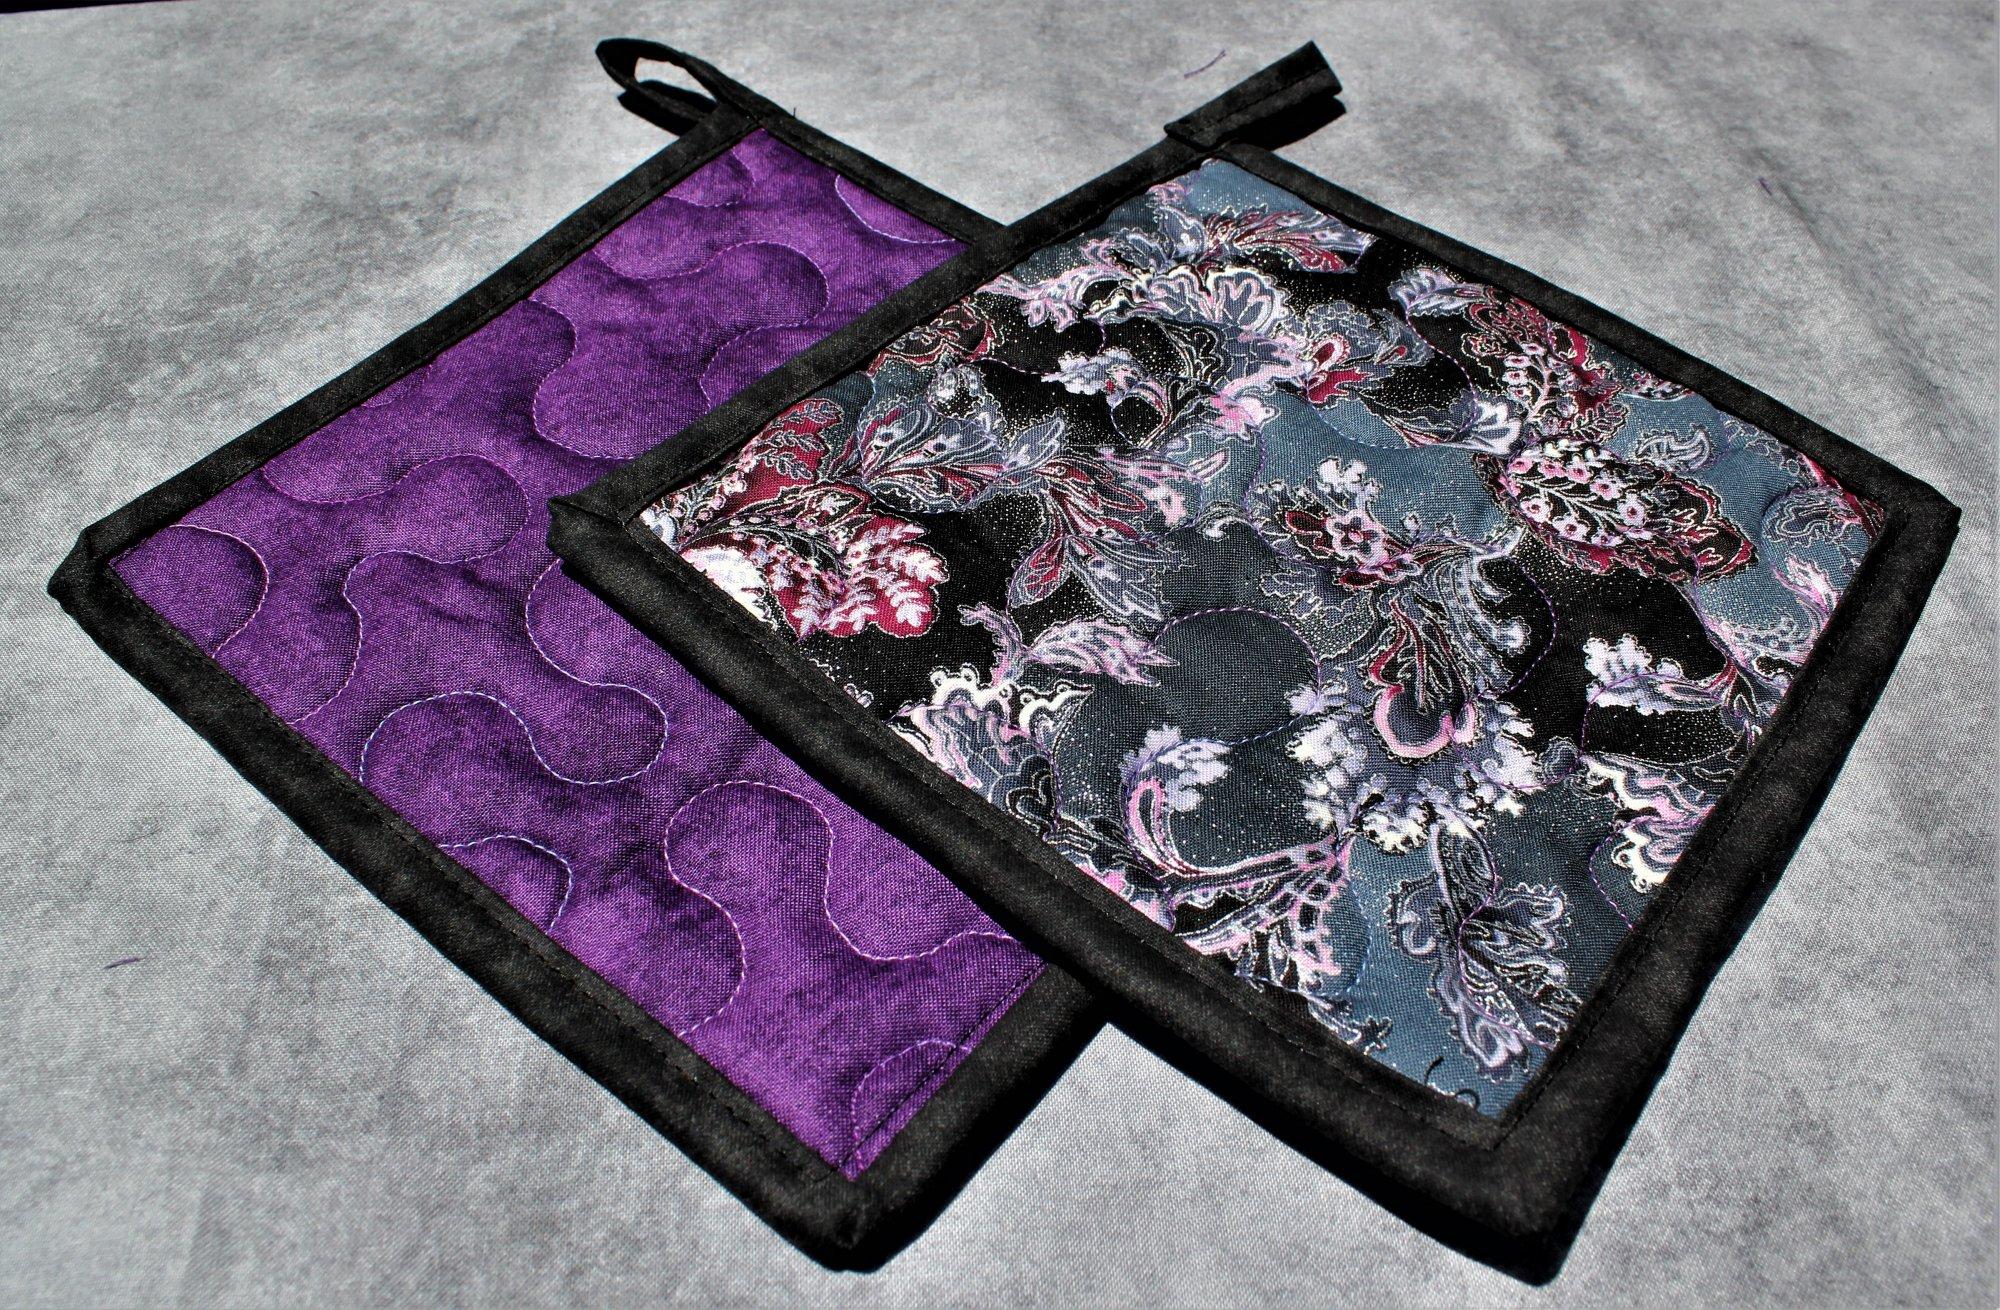 Glittering Pink/Purple/Black Paisleys and Flowers Potholders Set of 2